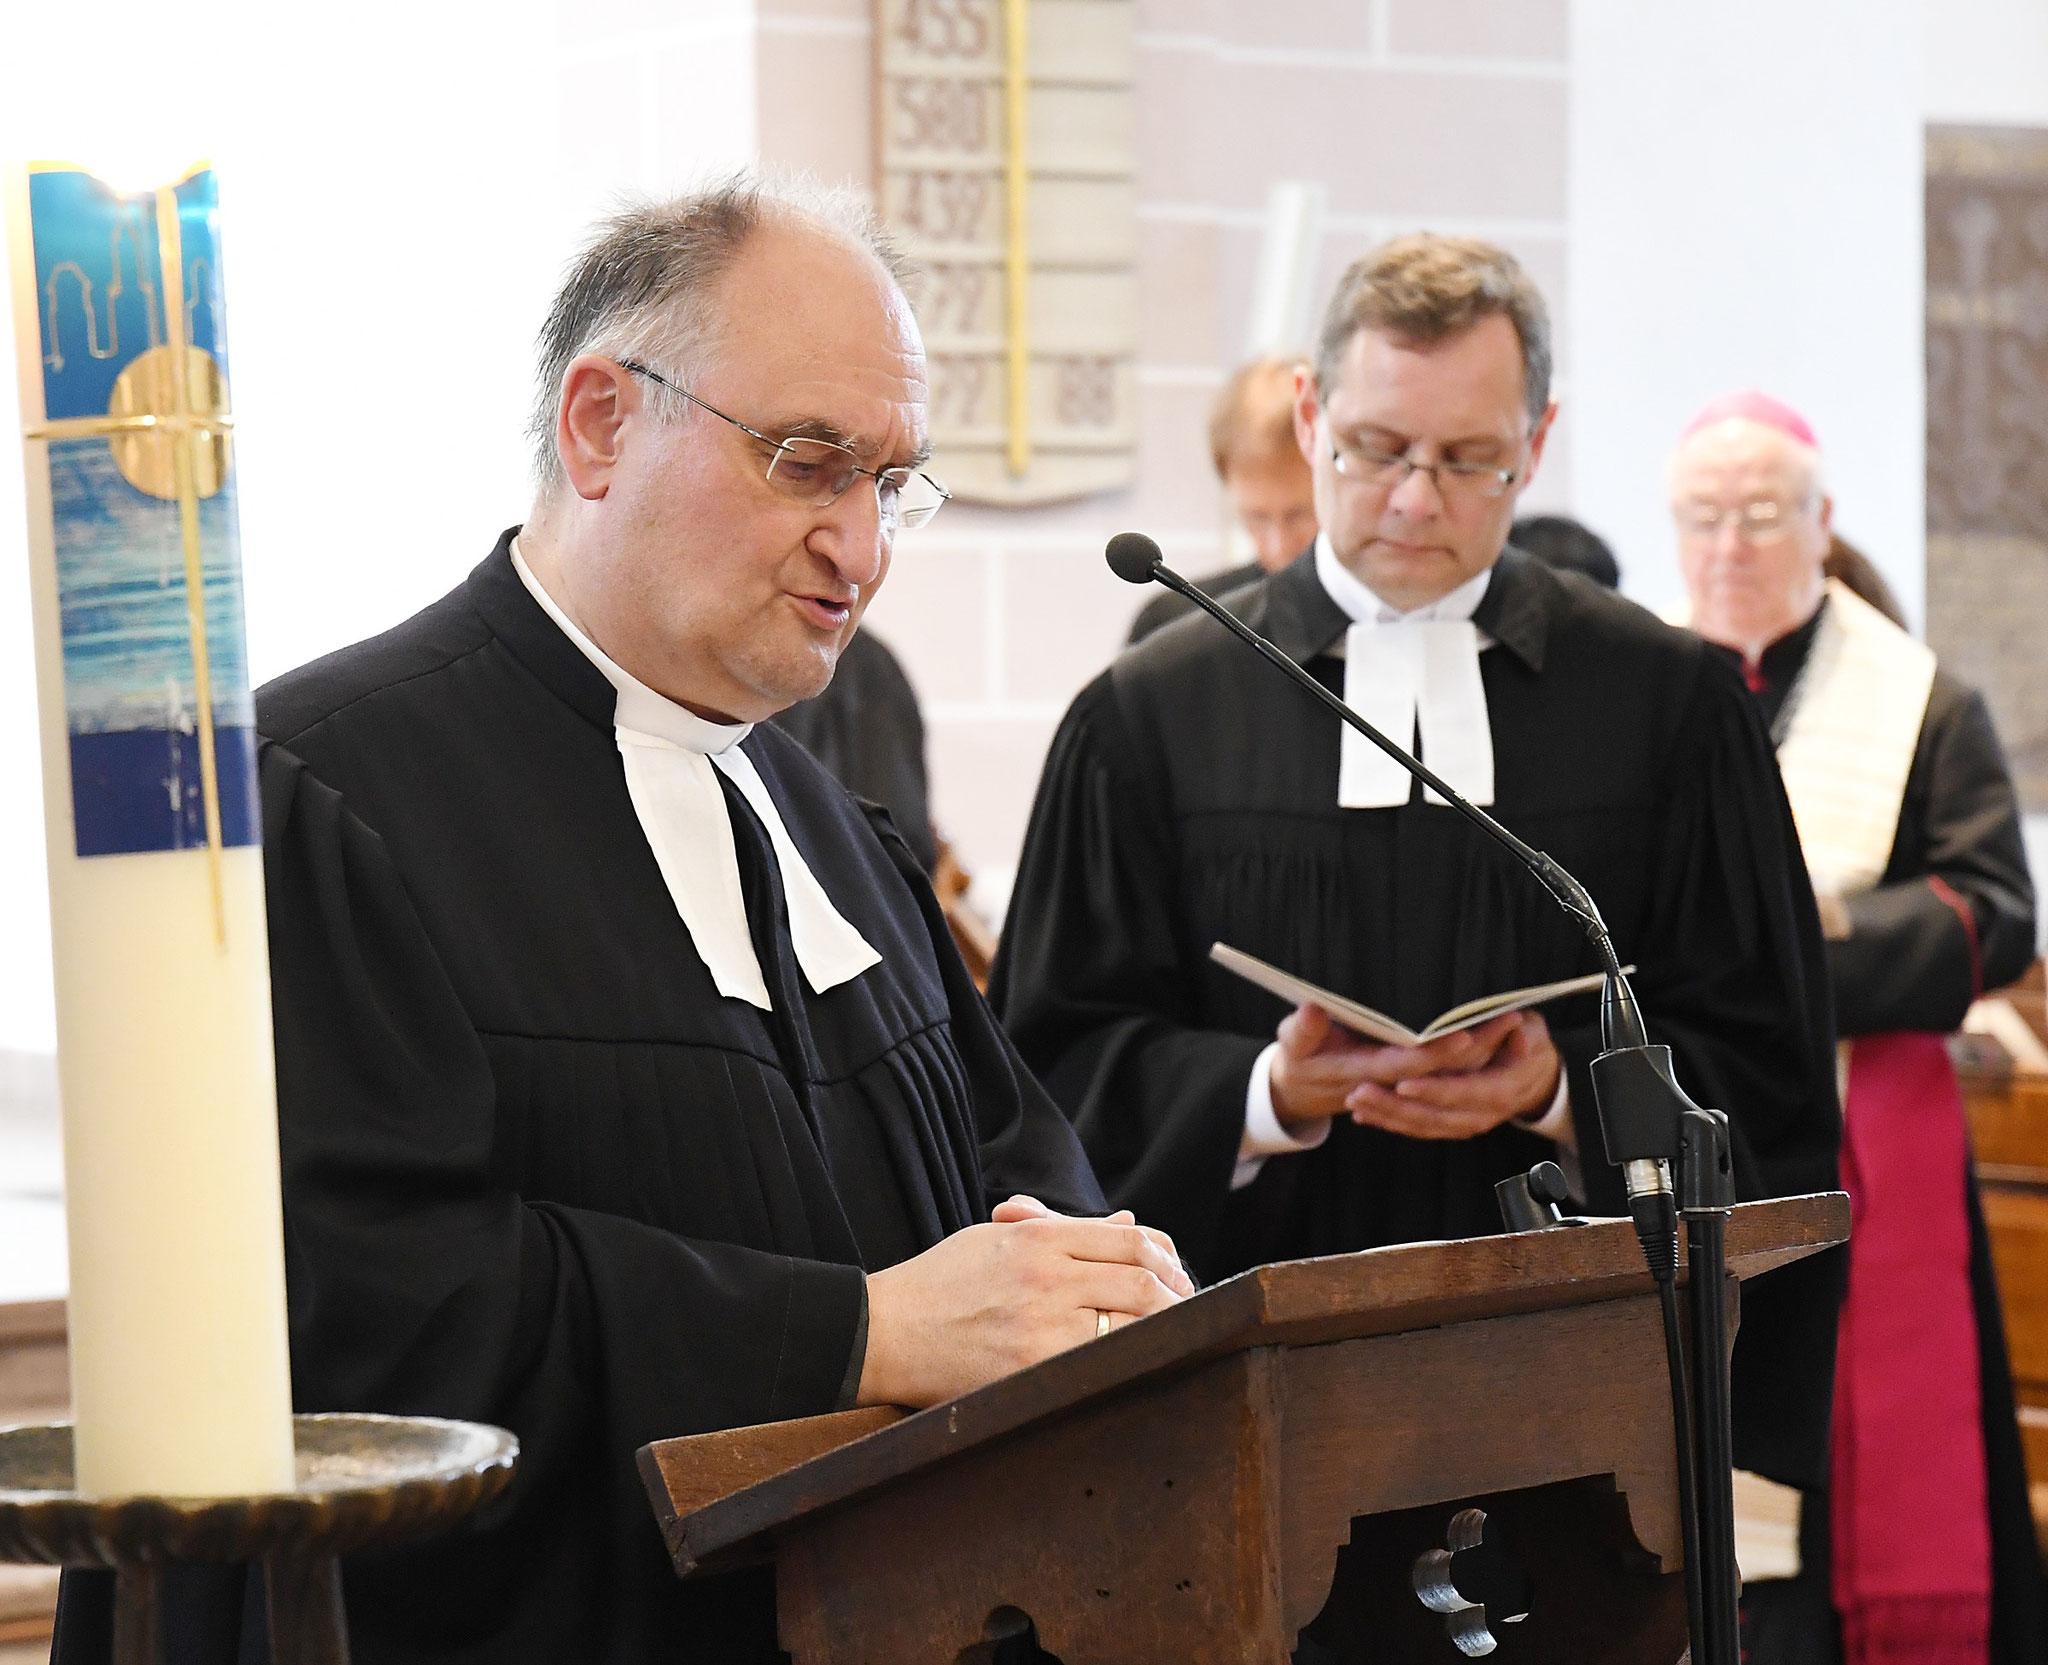 Pfarrer Michael Henheik und Pfarrer Gunnar Wirth. Foto: Maria Hopp